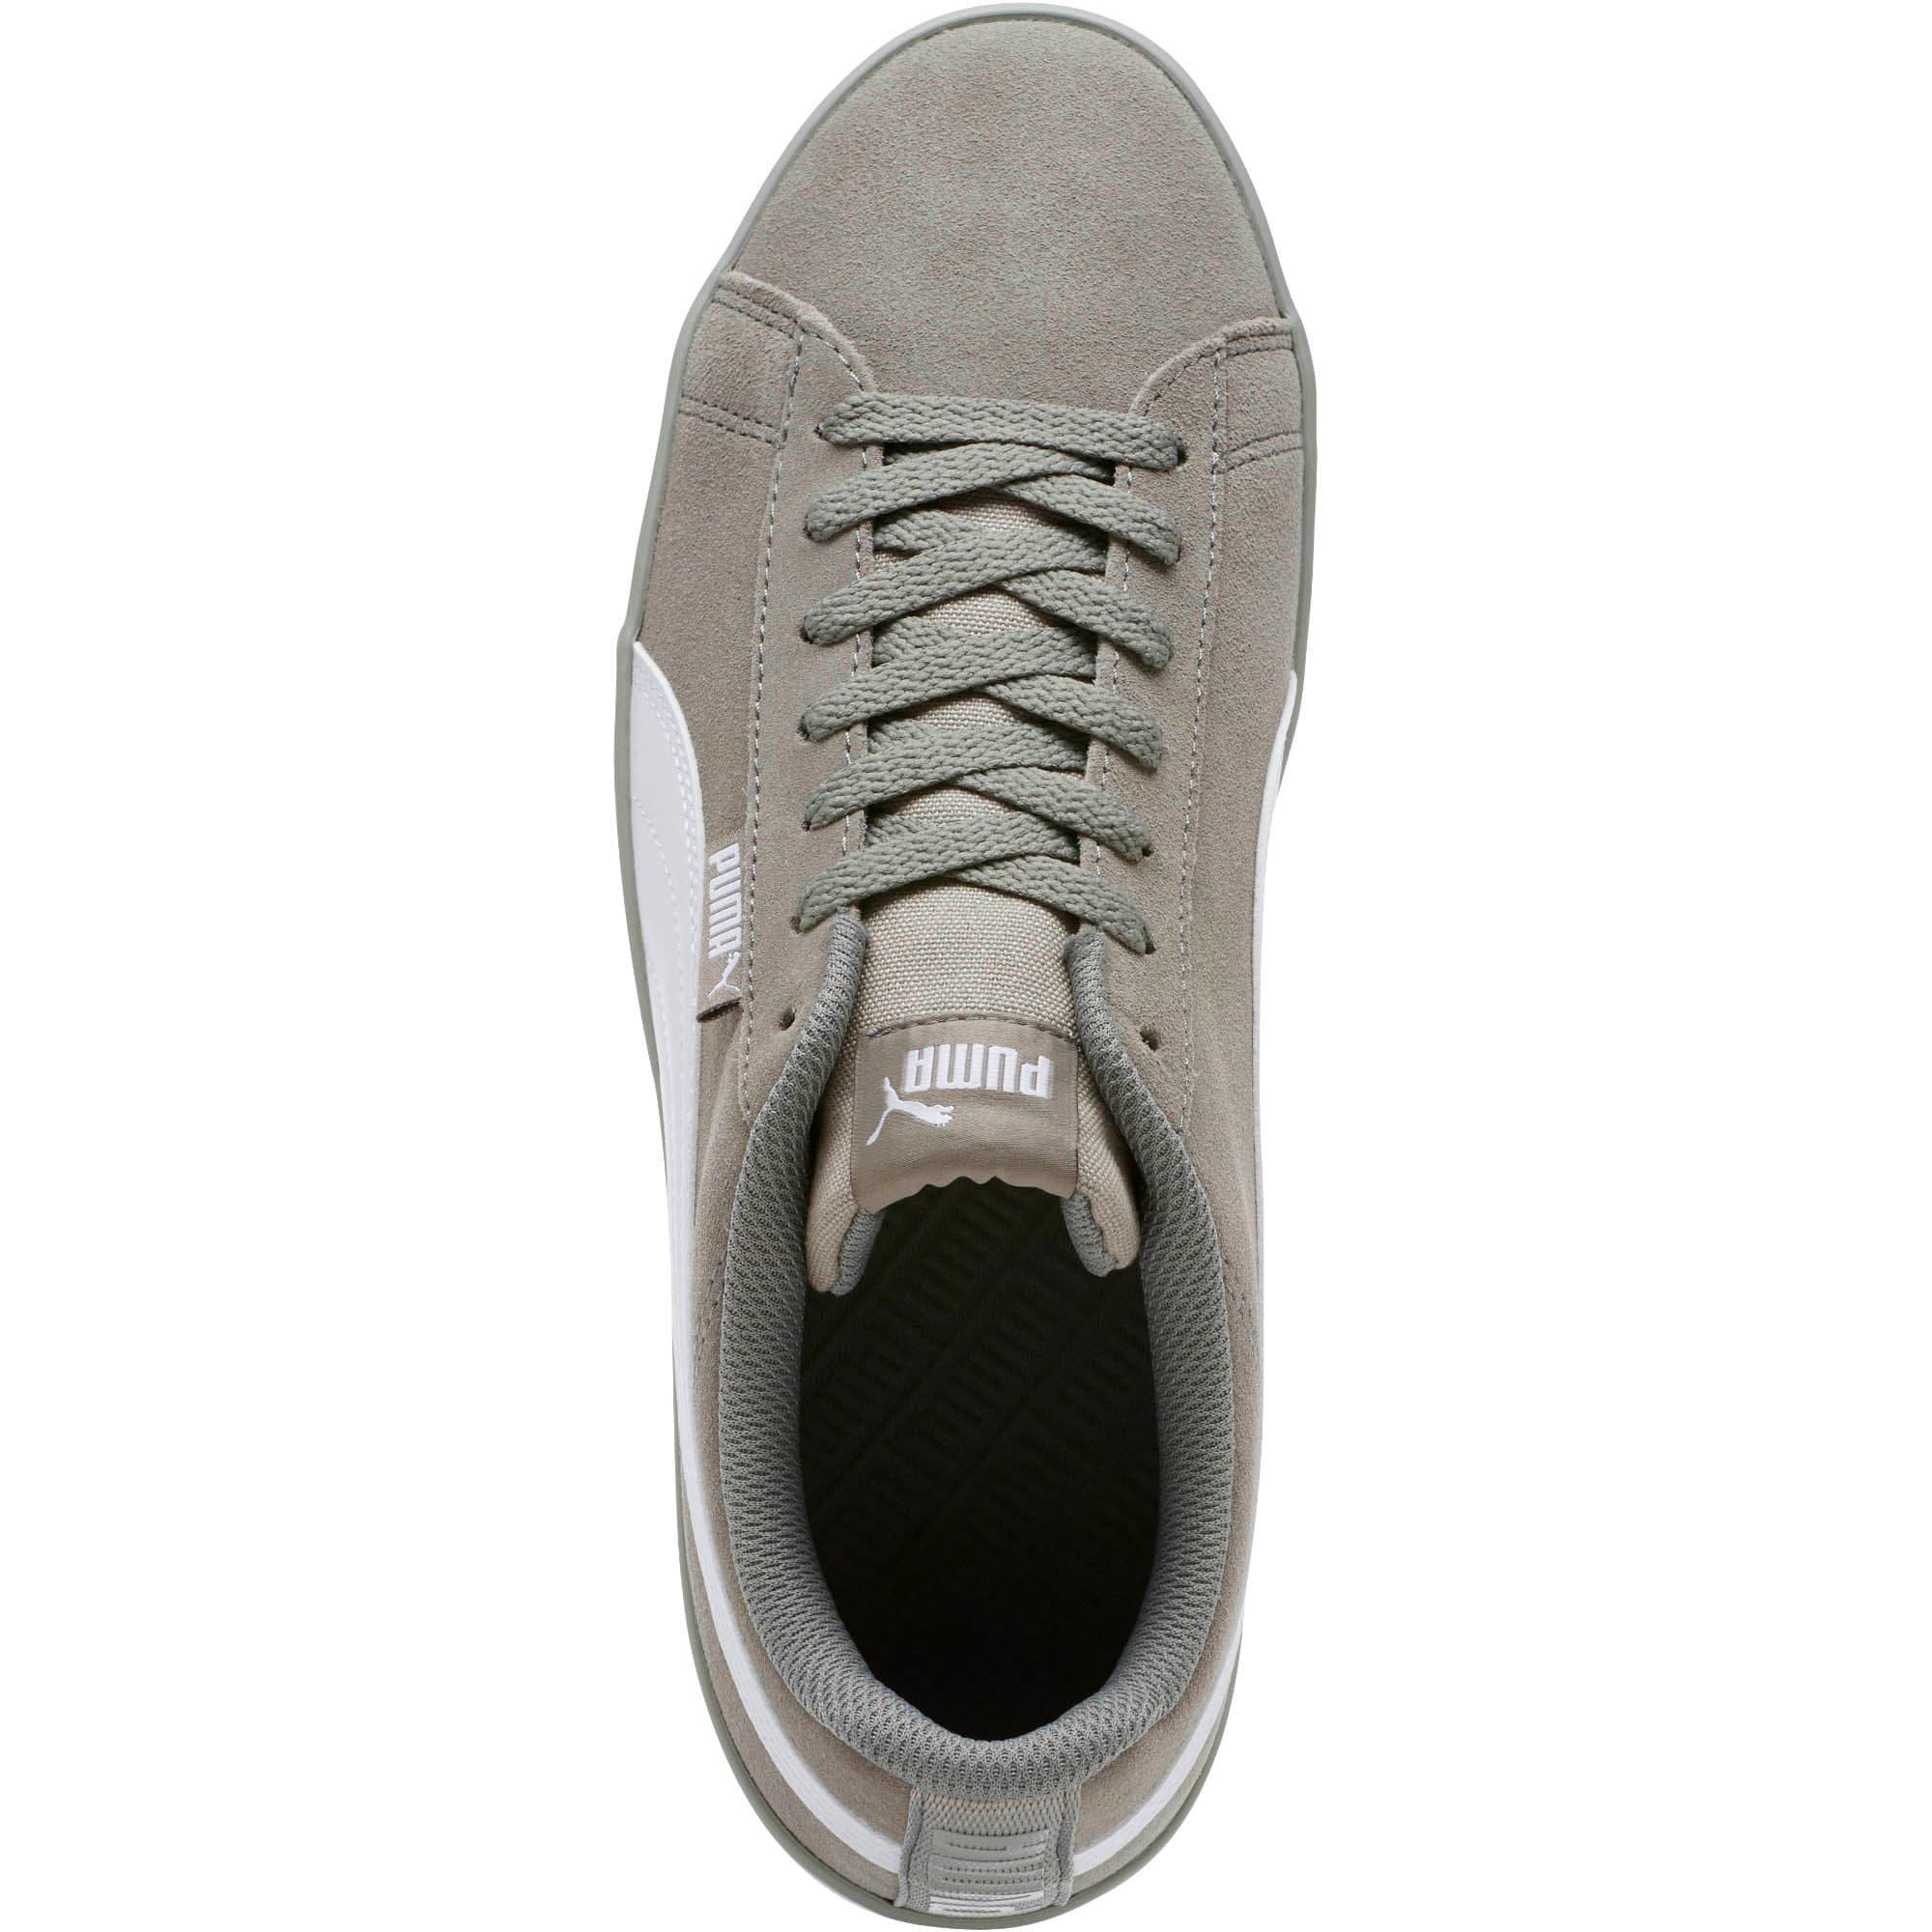 Thumbnail 5 of Urban Plus Suede Sneakers, Rock Ridge-Puma White, medium